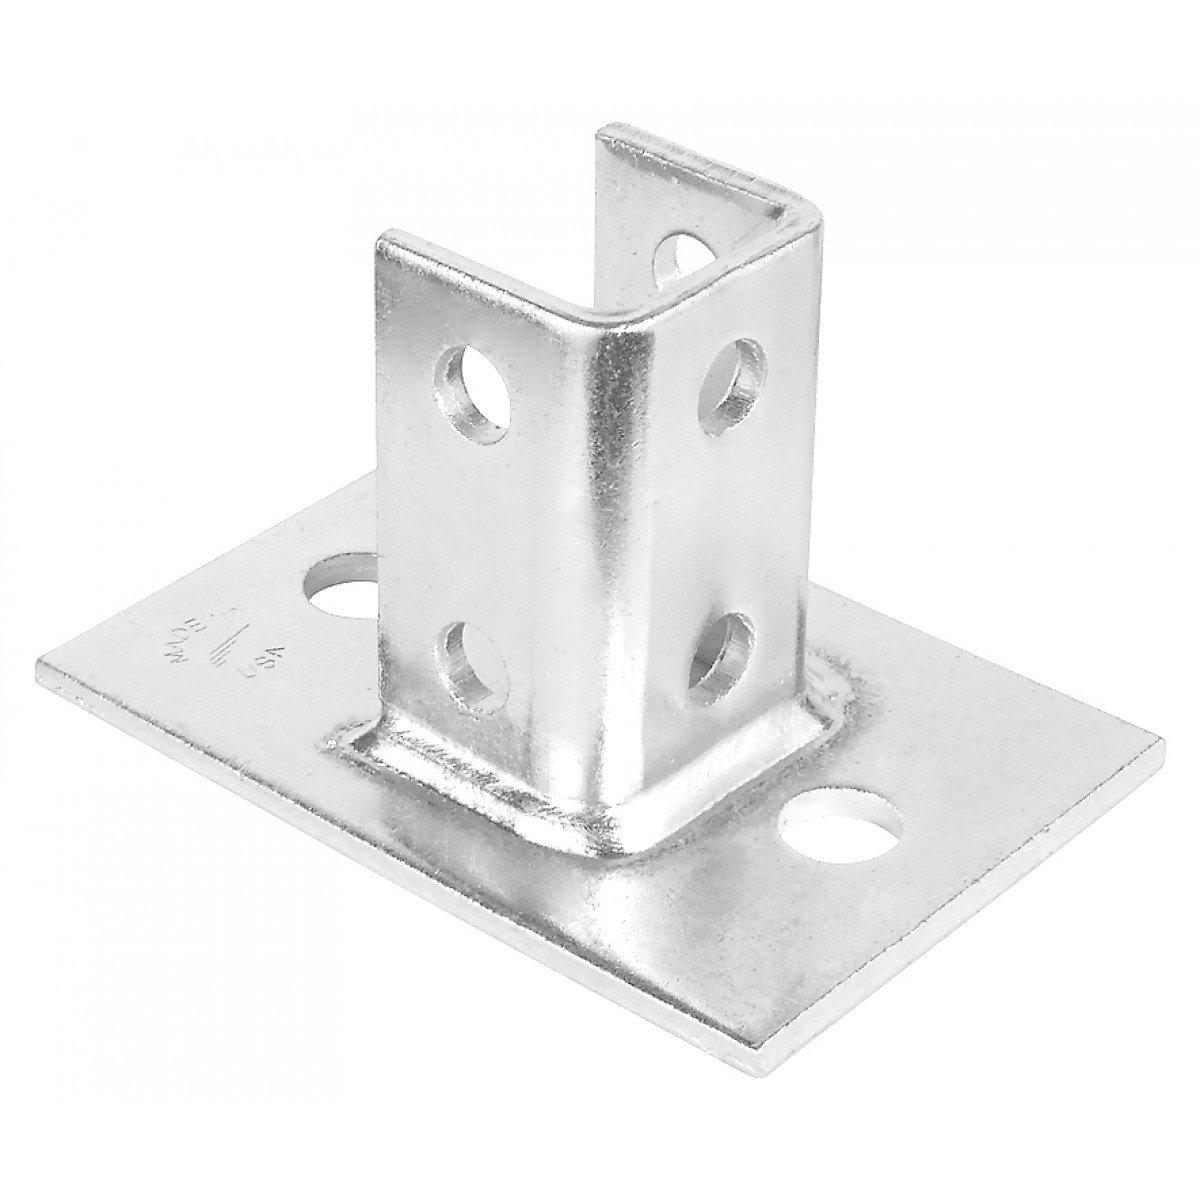 1 Pc, 2 Hole Single Channel Post Base, For 1-5/8 In. Strut, Zinc Plated Steel